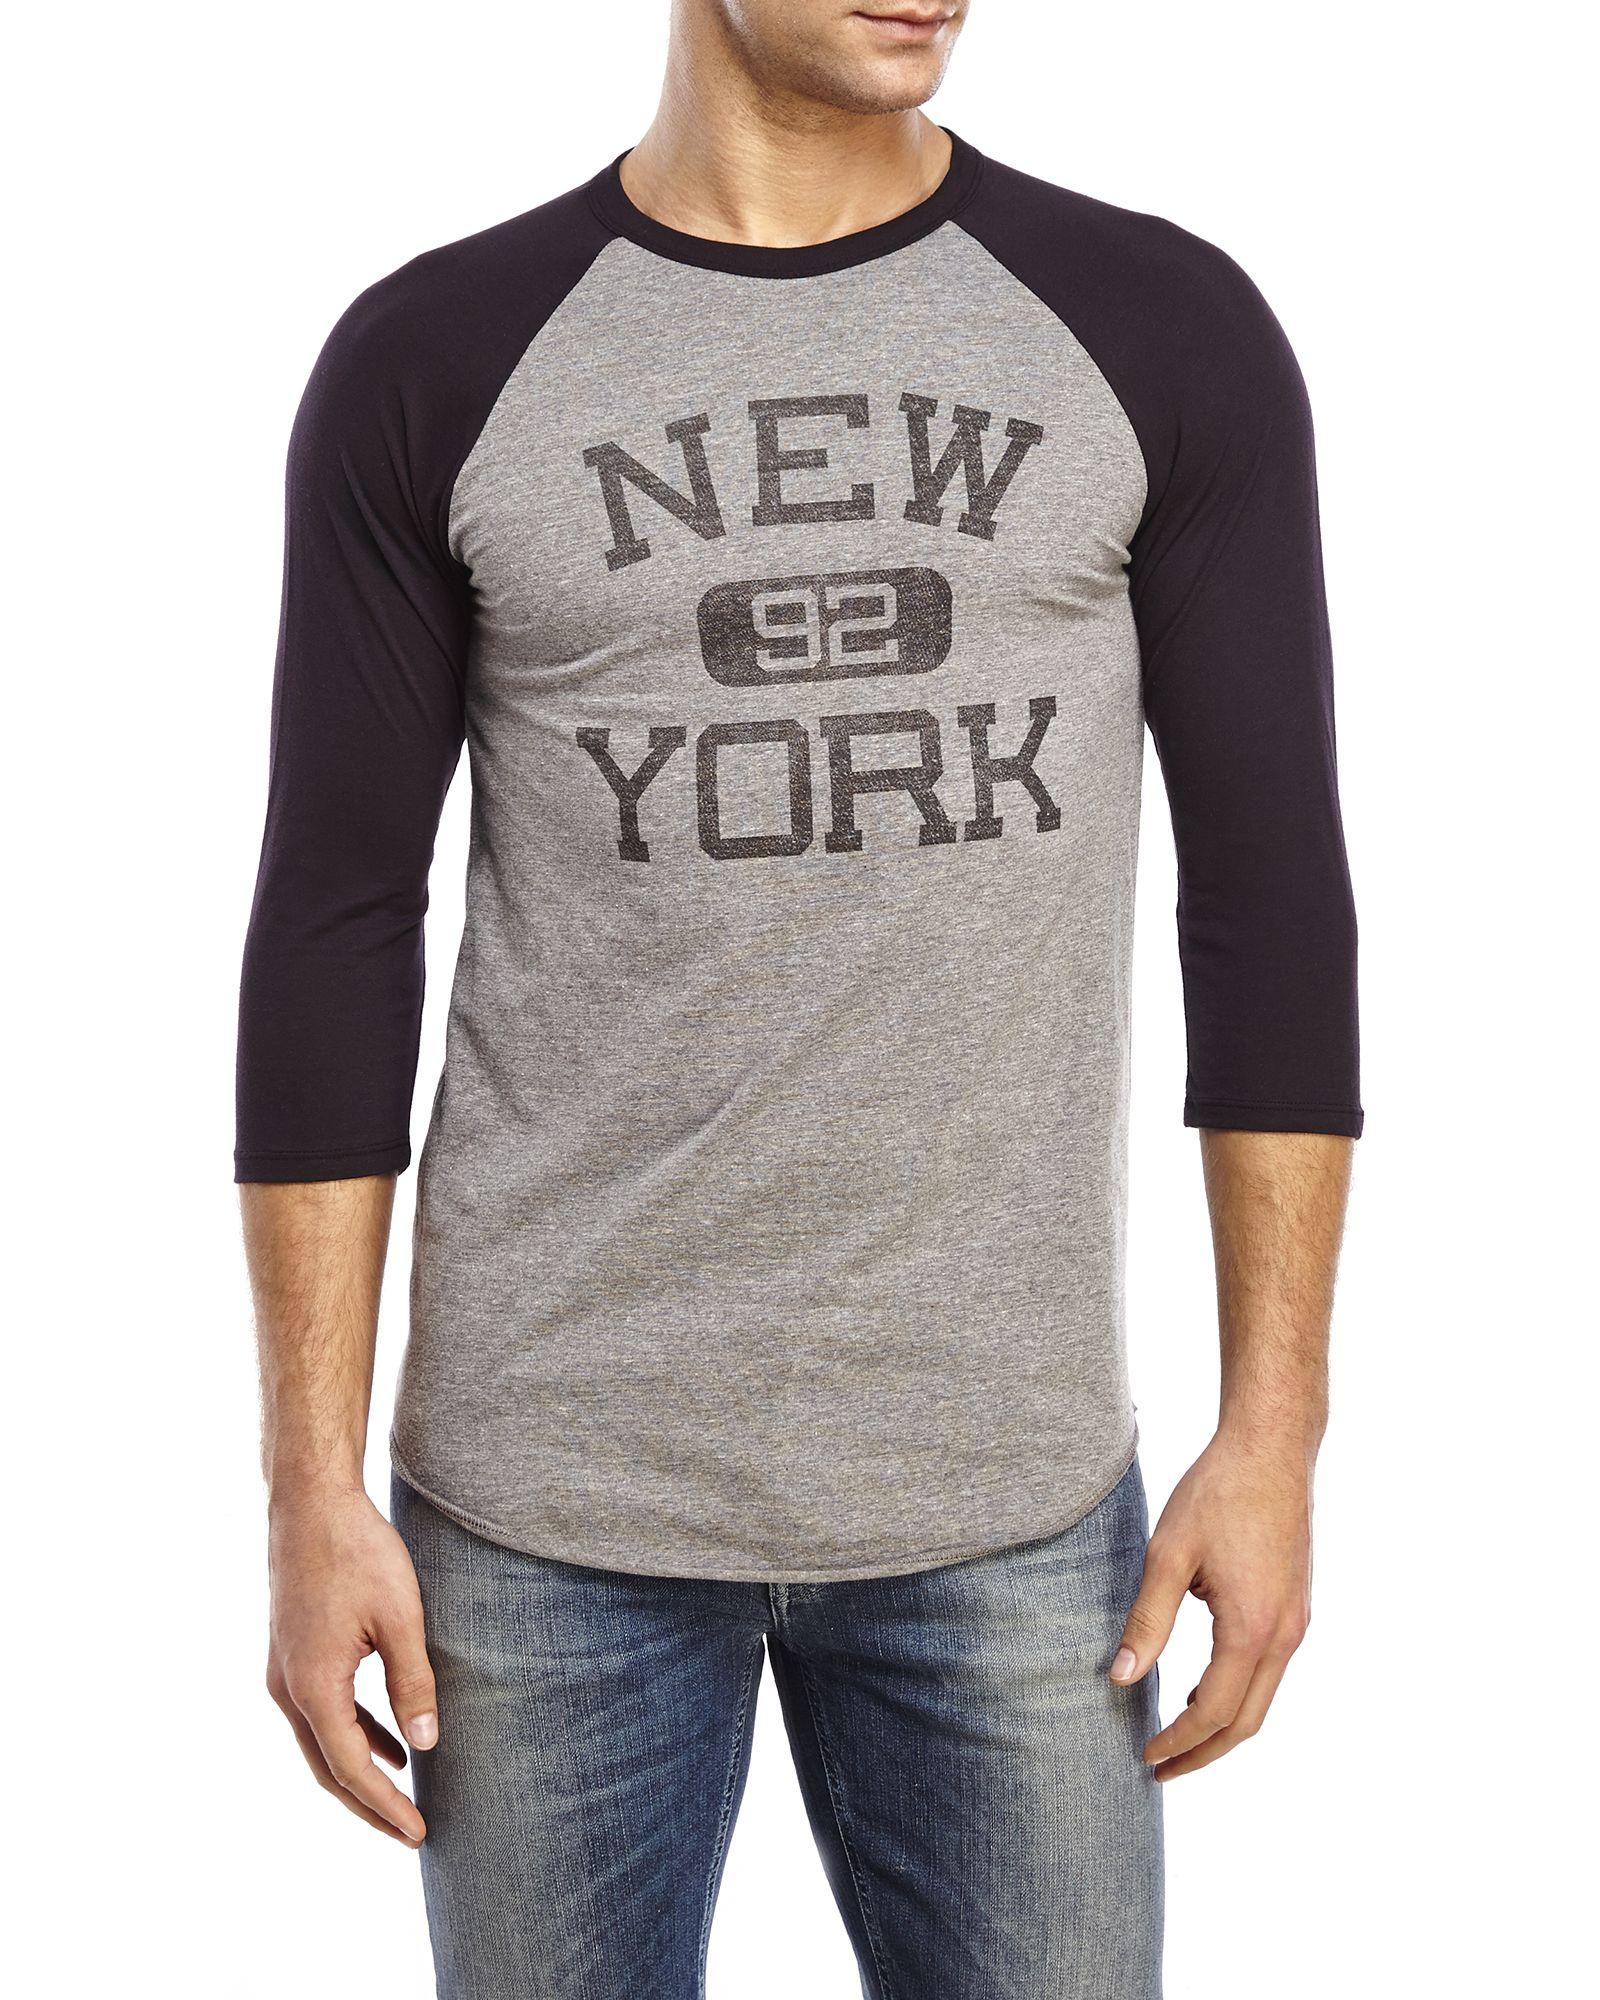 Body Rags Vintage New York 92 Tee